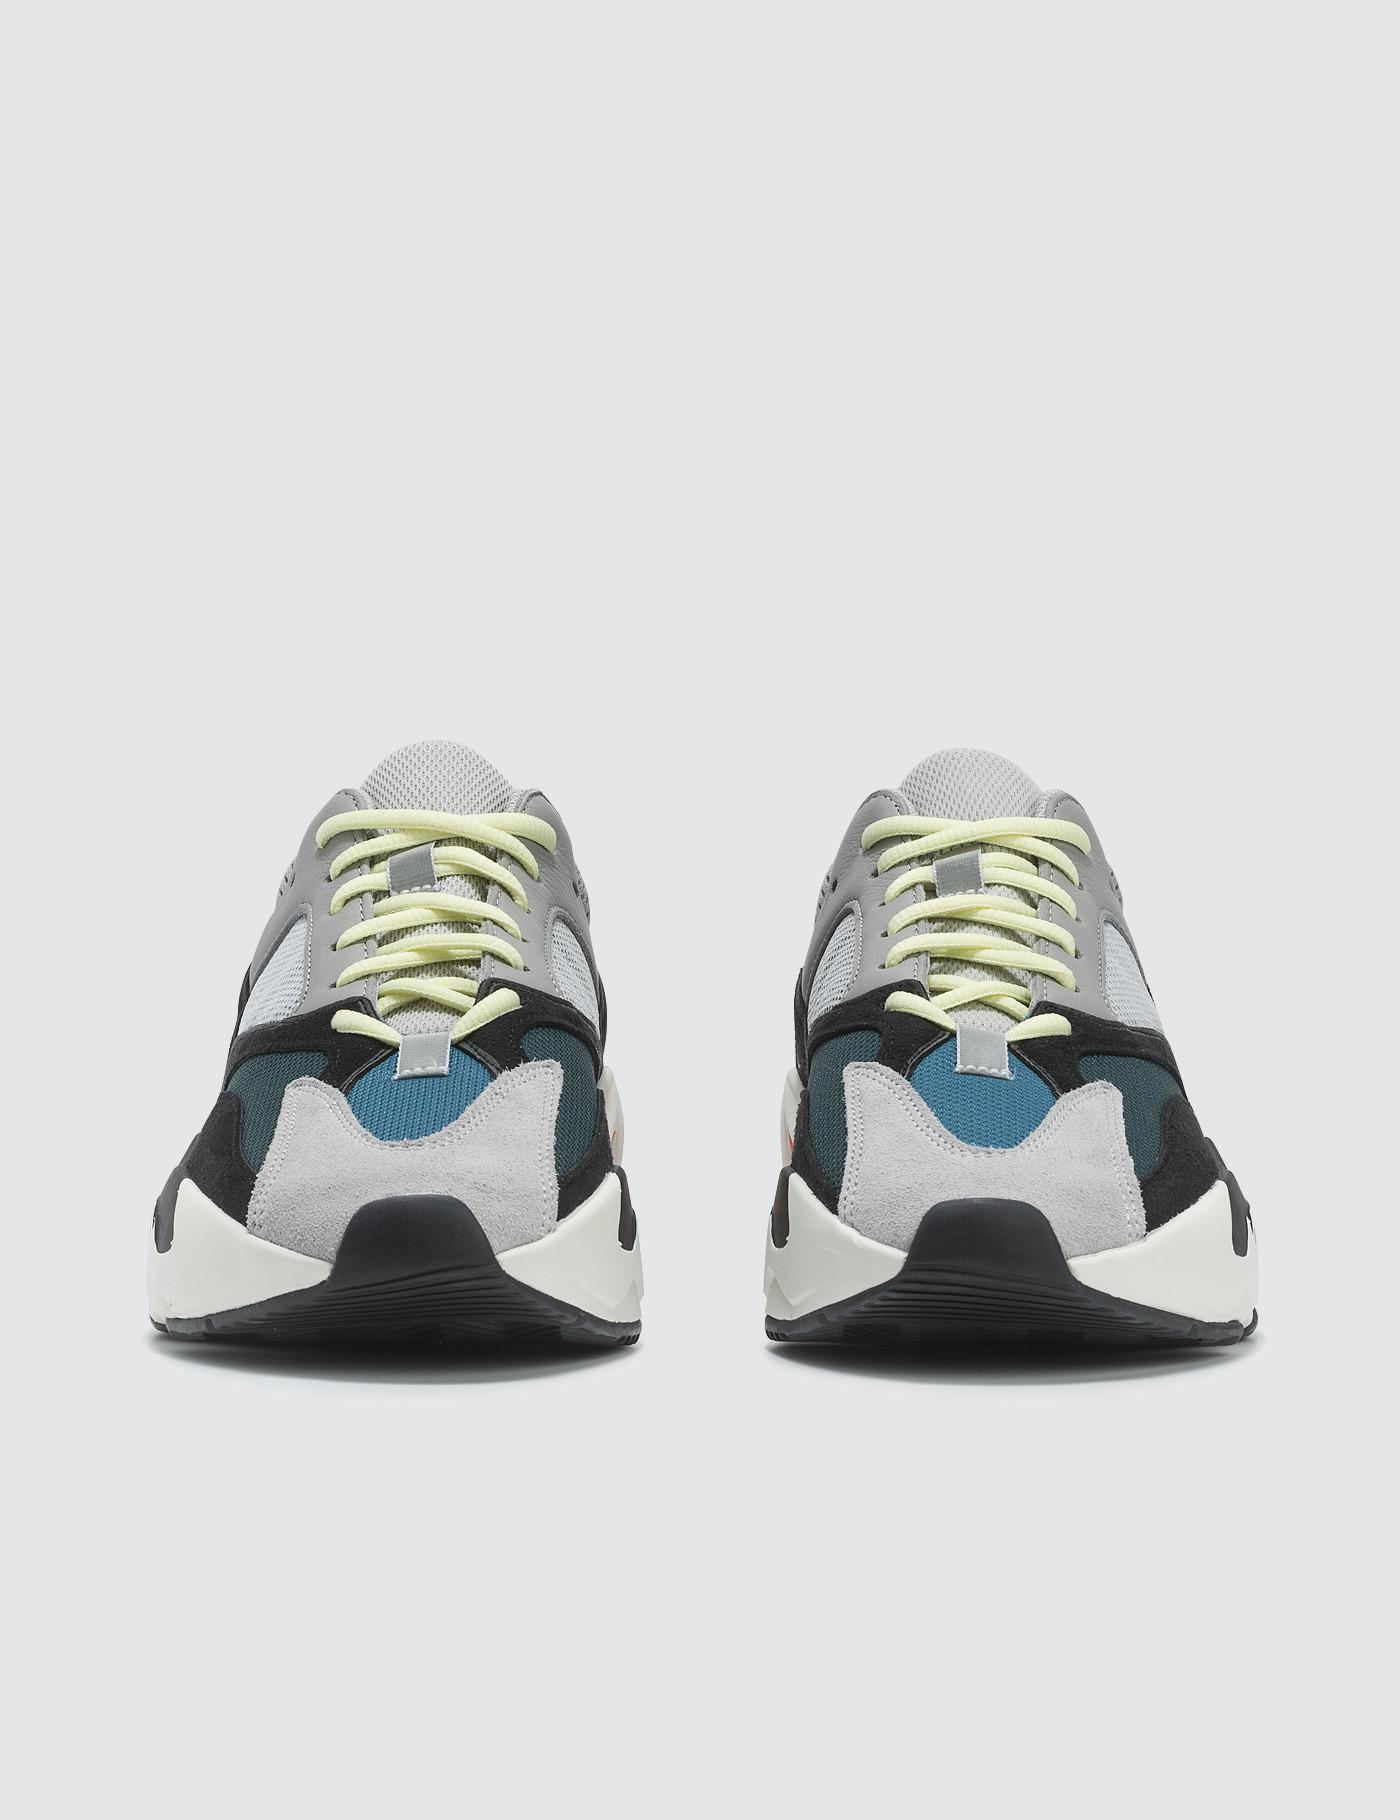 d0cc33fe3406f Lyst - adidas Originals Yeezy Boost 700 in Gray for Men